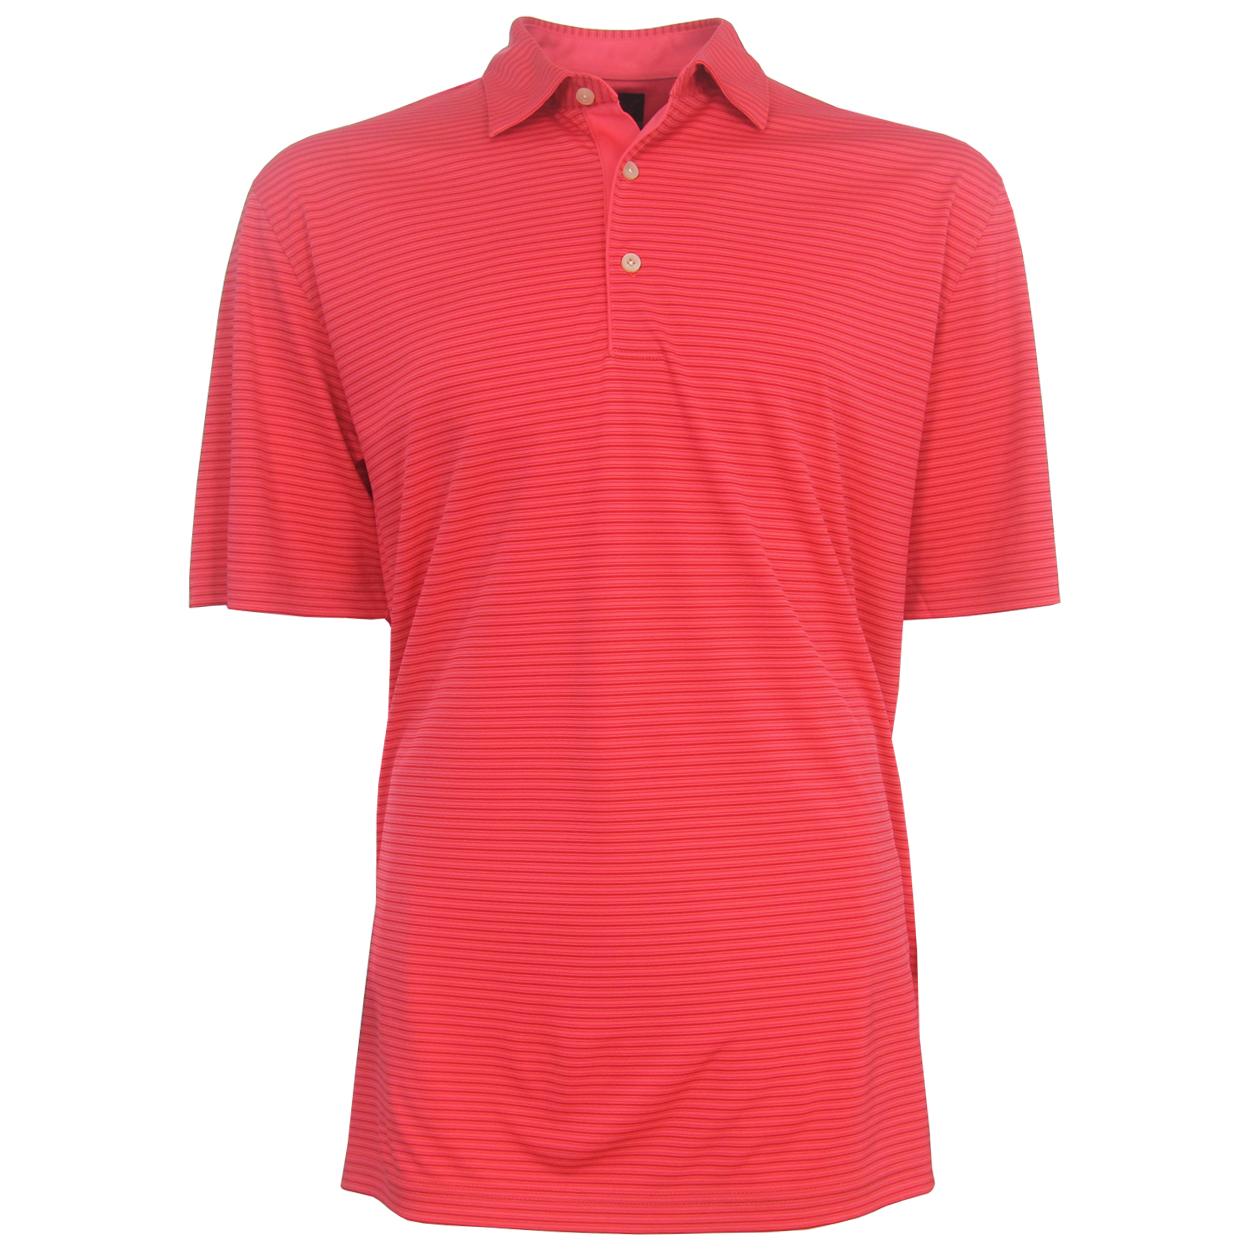 Greg norman ml75 tonal striped polo golf shirt closeout for Greg norman ml75 shirts